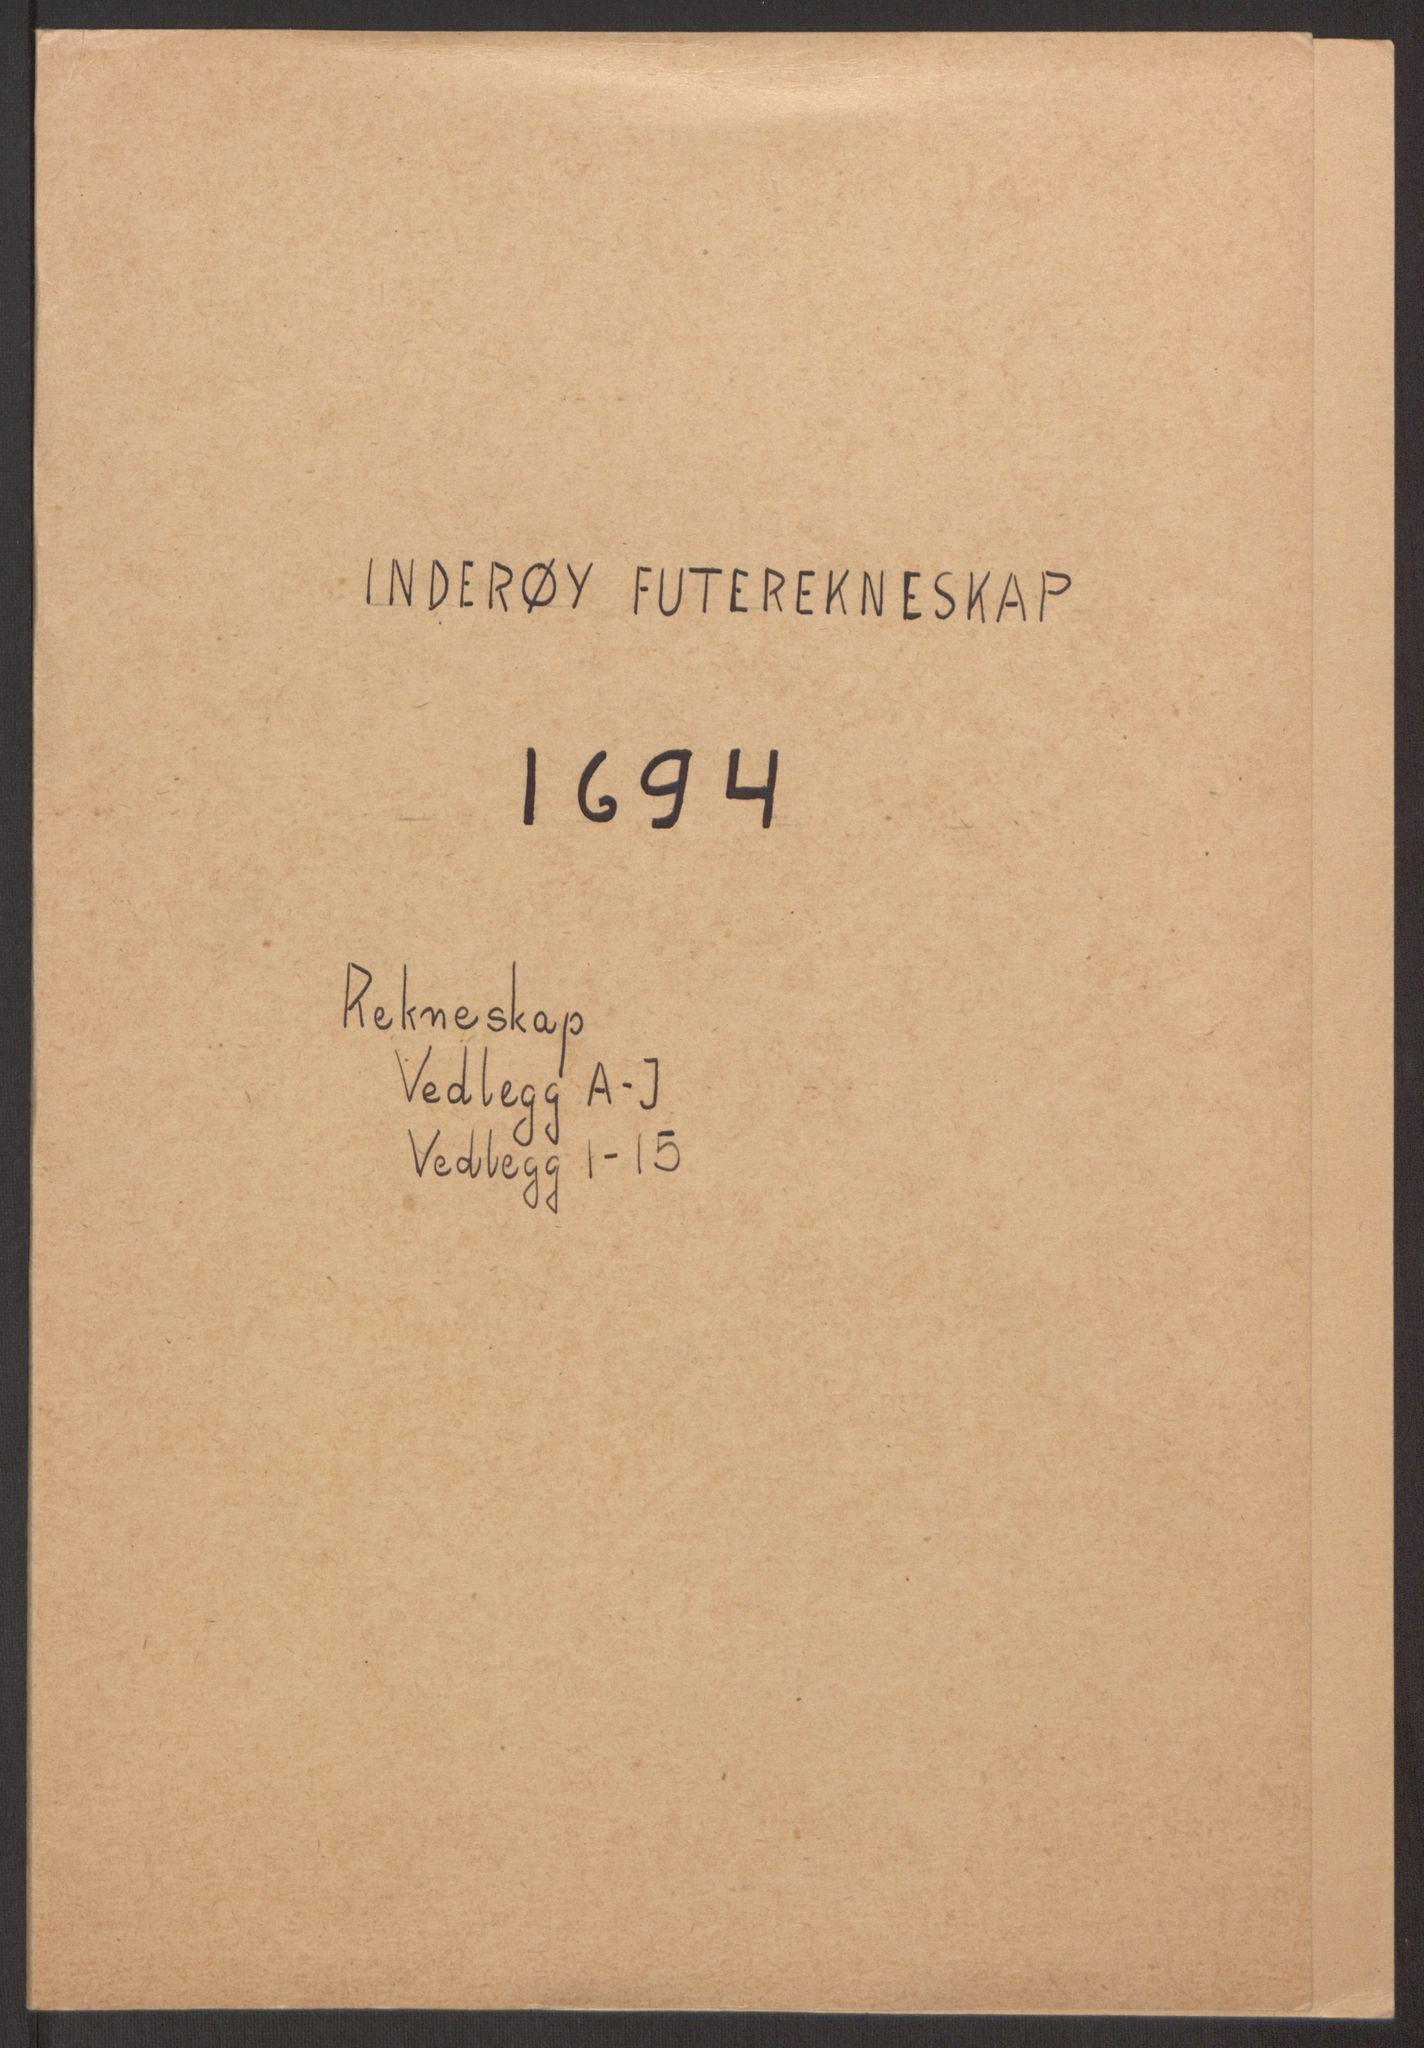 RA, Rentekammeret inntil 1814, Reviderte regnskaper, Fogderegnskap, R63/L4308: Fogderegnskap Inderøy, 1692-1694, s. 521